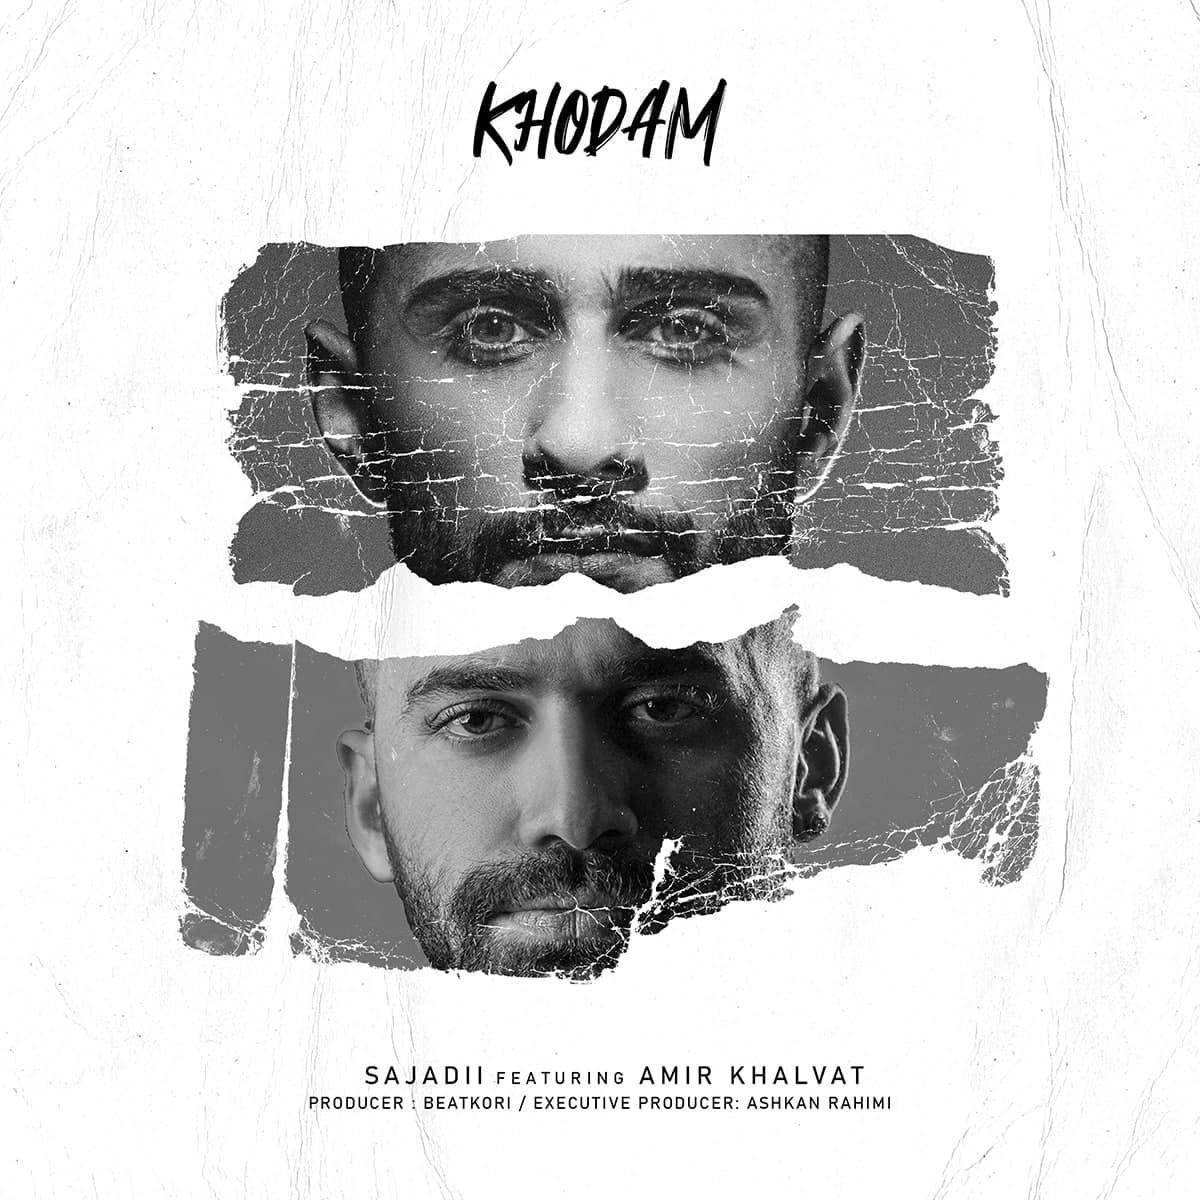 Sajadii Ft Amir Khalvat - Khodam